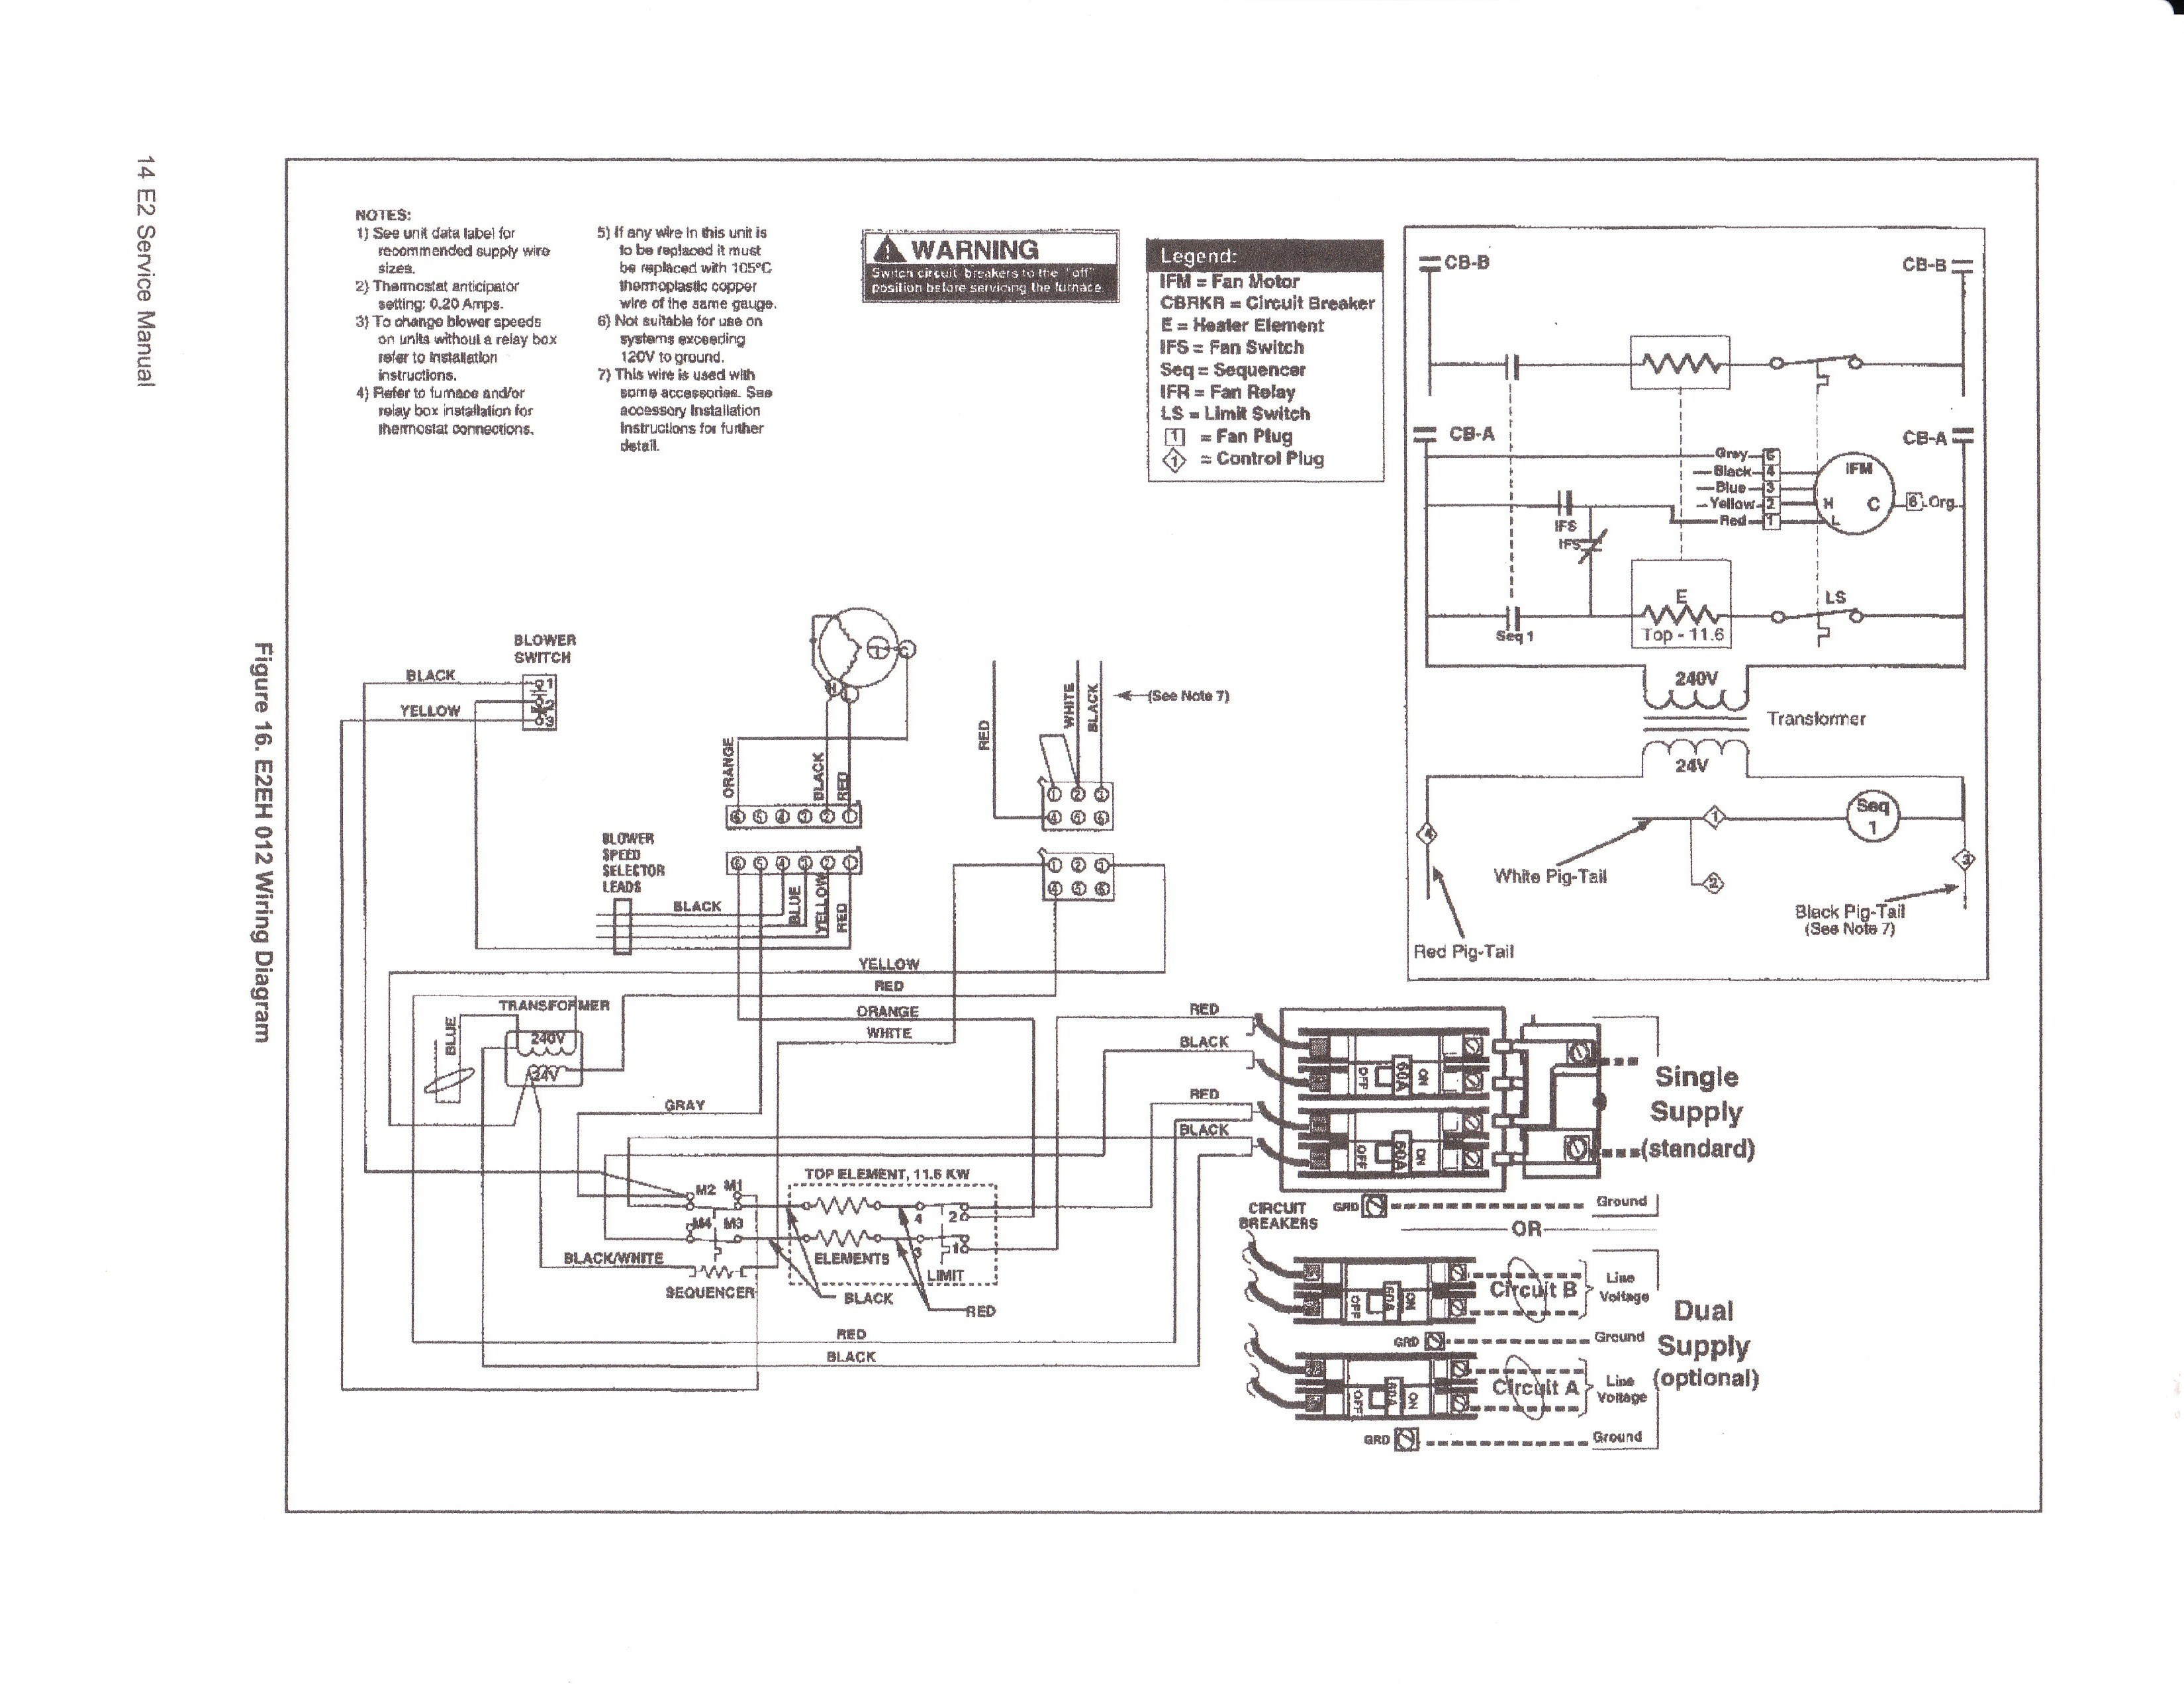 Gas Valve Wiring Diagram Bryant Gas Valve Wiring Diagram Wire Center • Of Gas  Valve Wiring